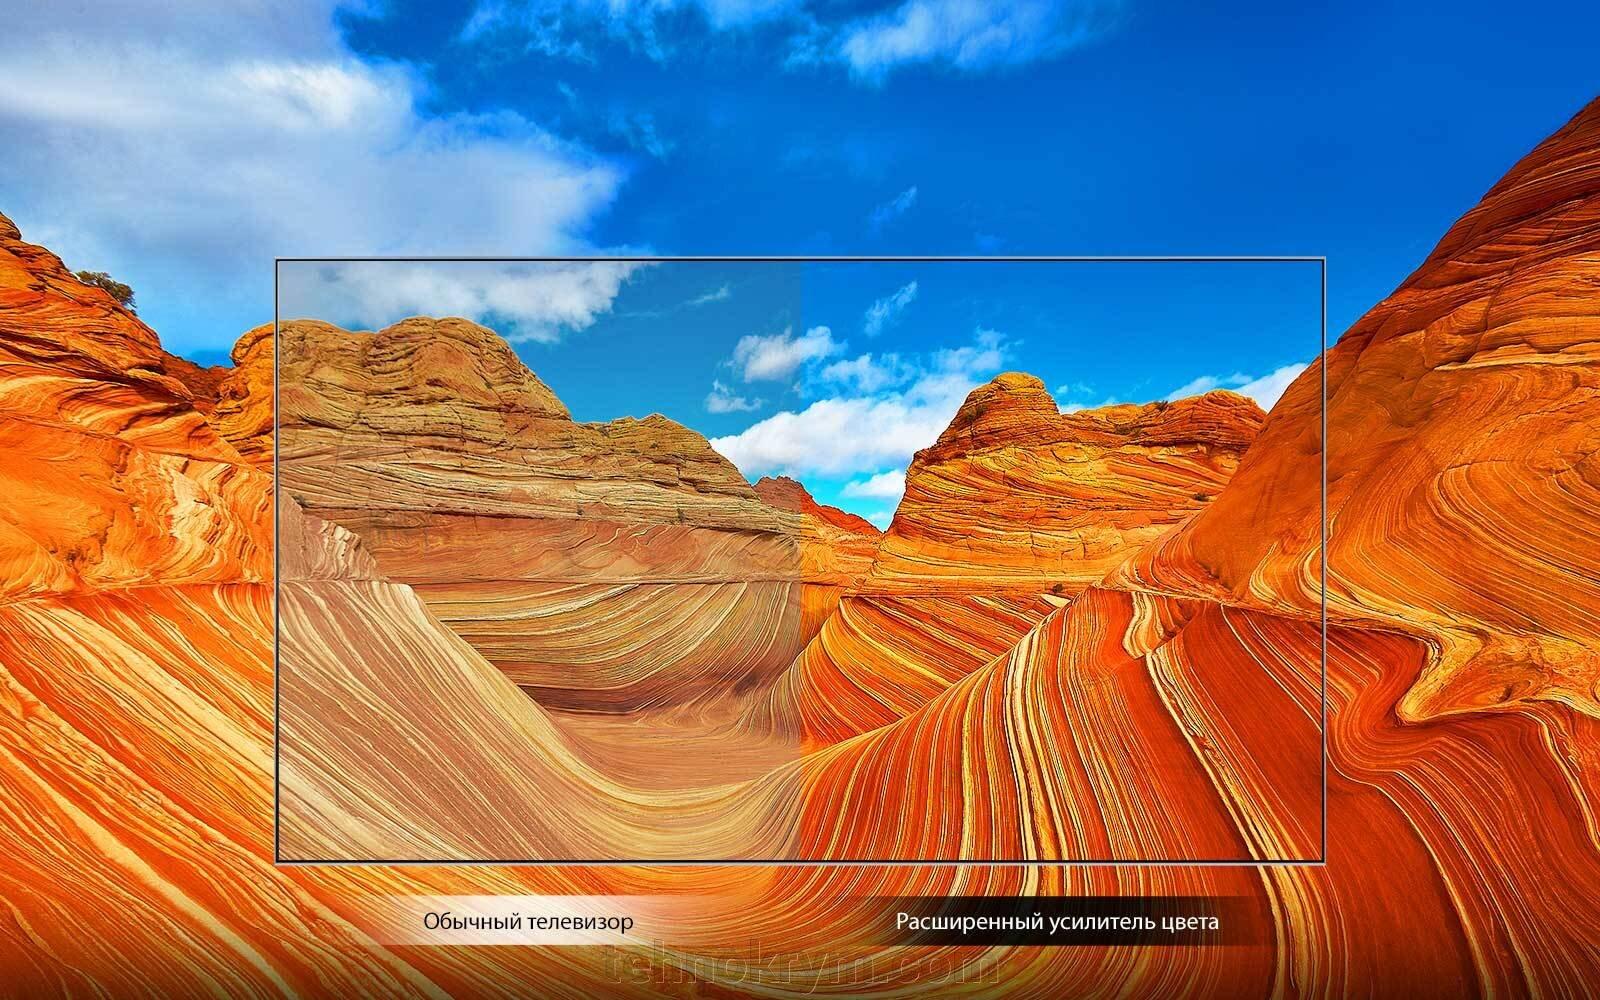 Smart телевизор LG 43UM7500PLA, Ultra HD, титан, webOS 4.5 - фото LG 43UM7500PLA